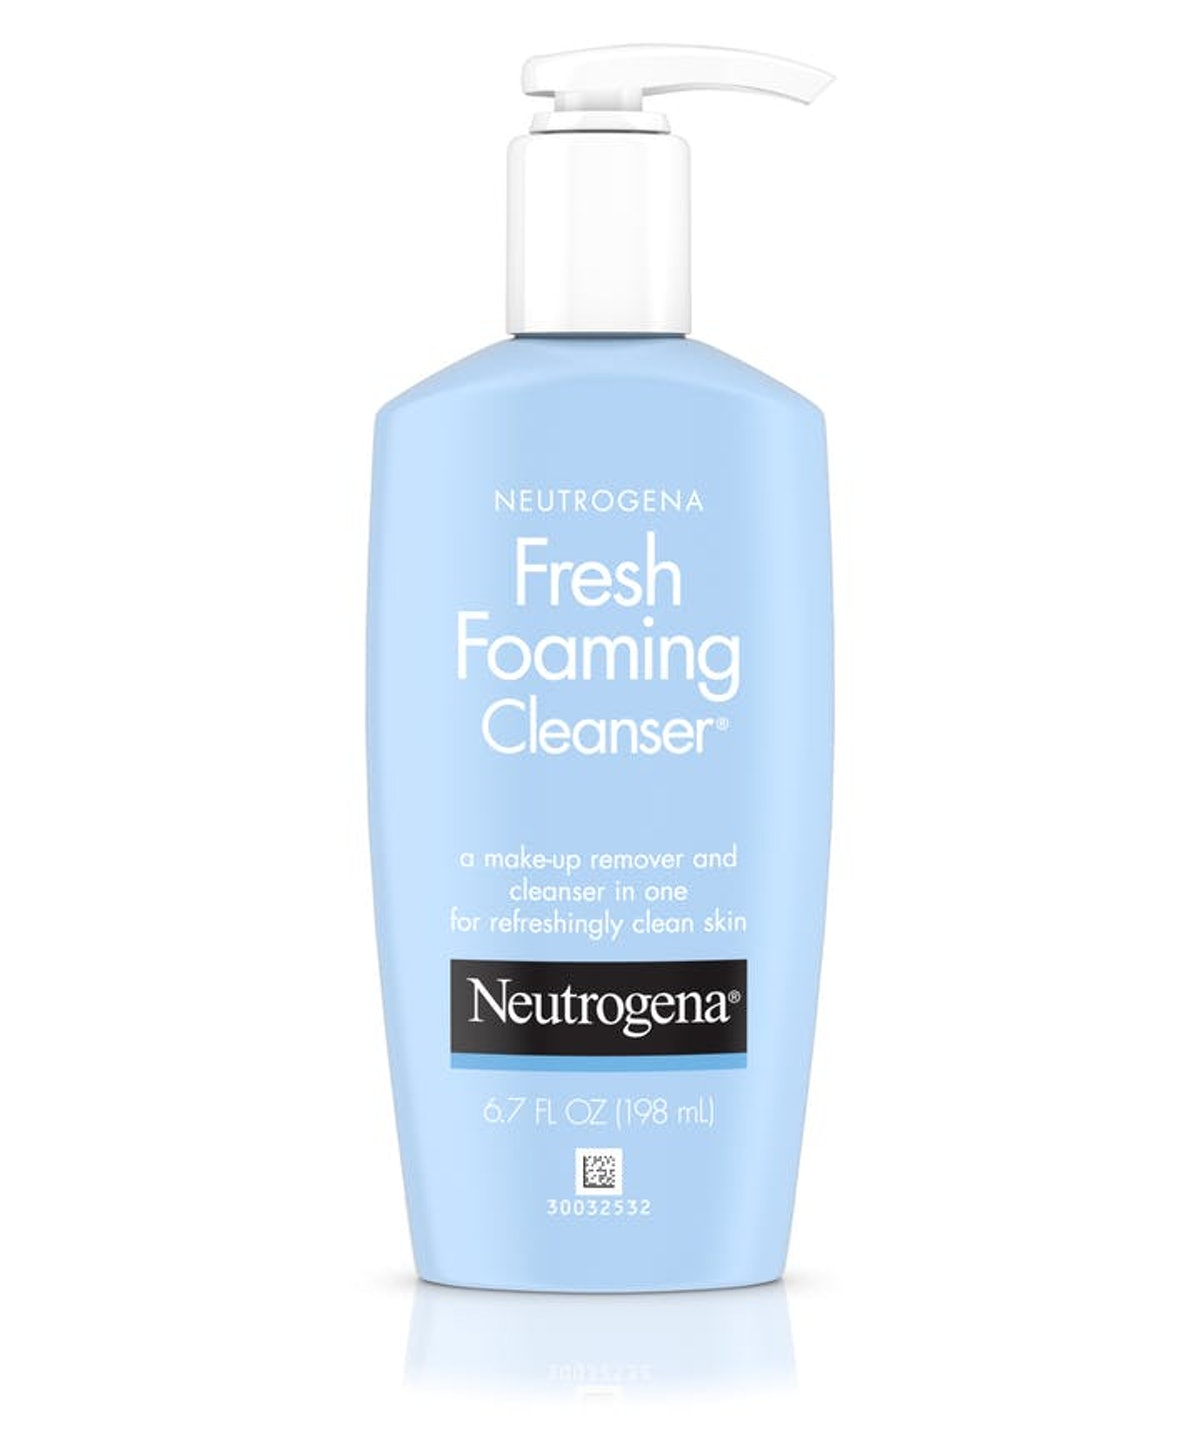 Neutrogena Fresh Foaming Cleanser-6.7 fl oz